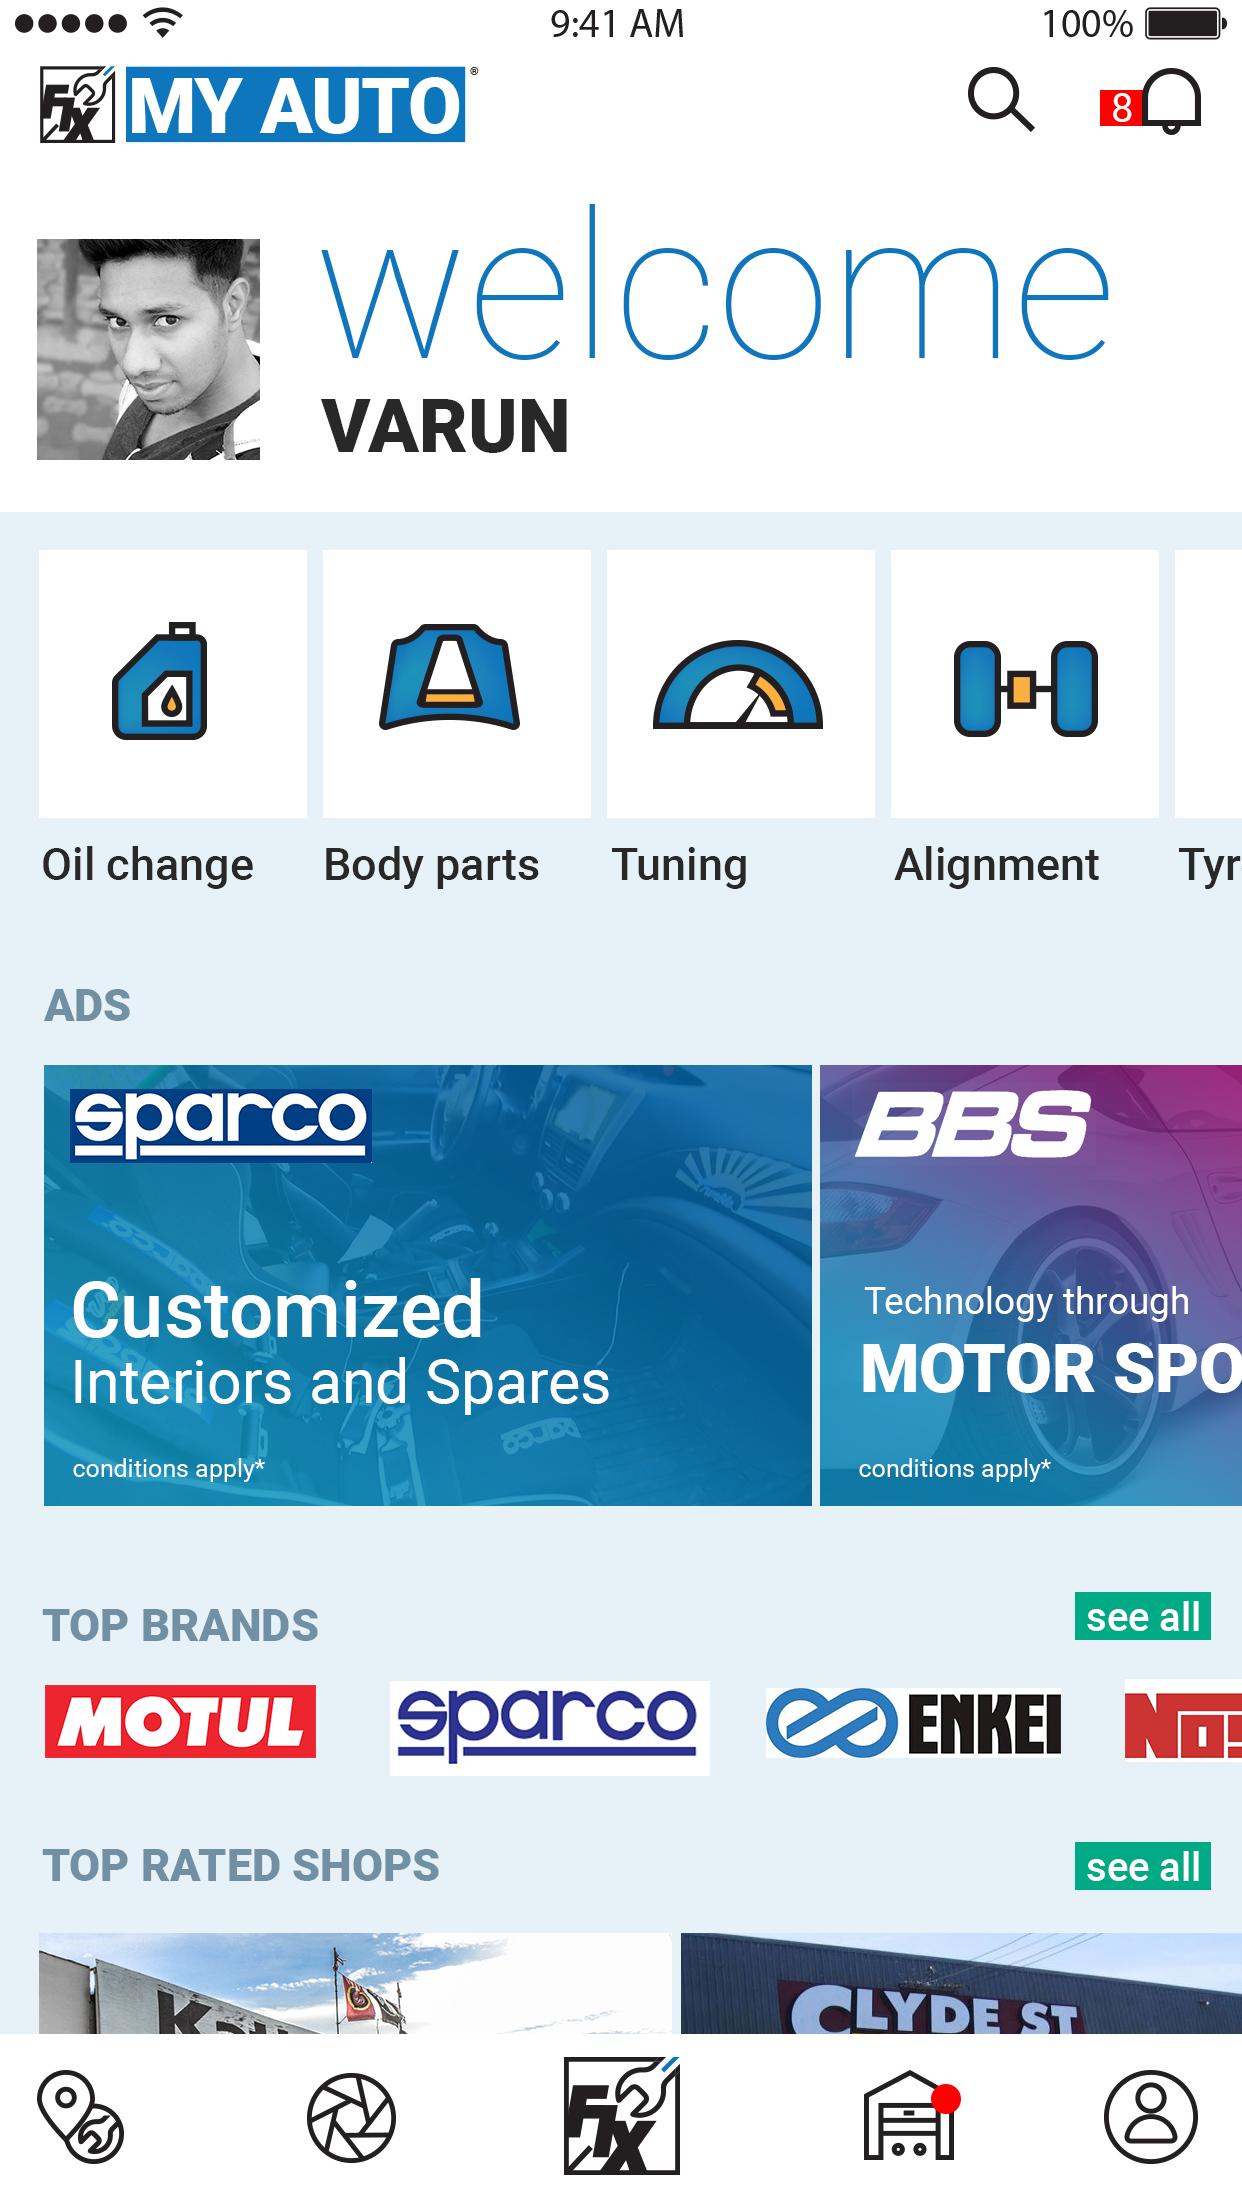 Fix My Auto - IONIC 3 Template   Repair, Oil change, Car